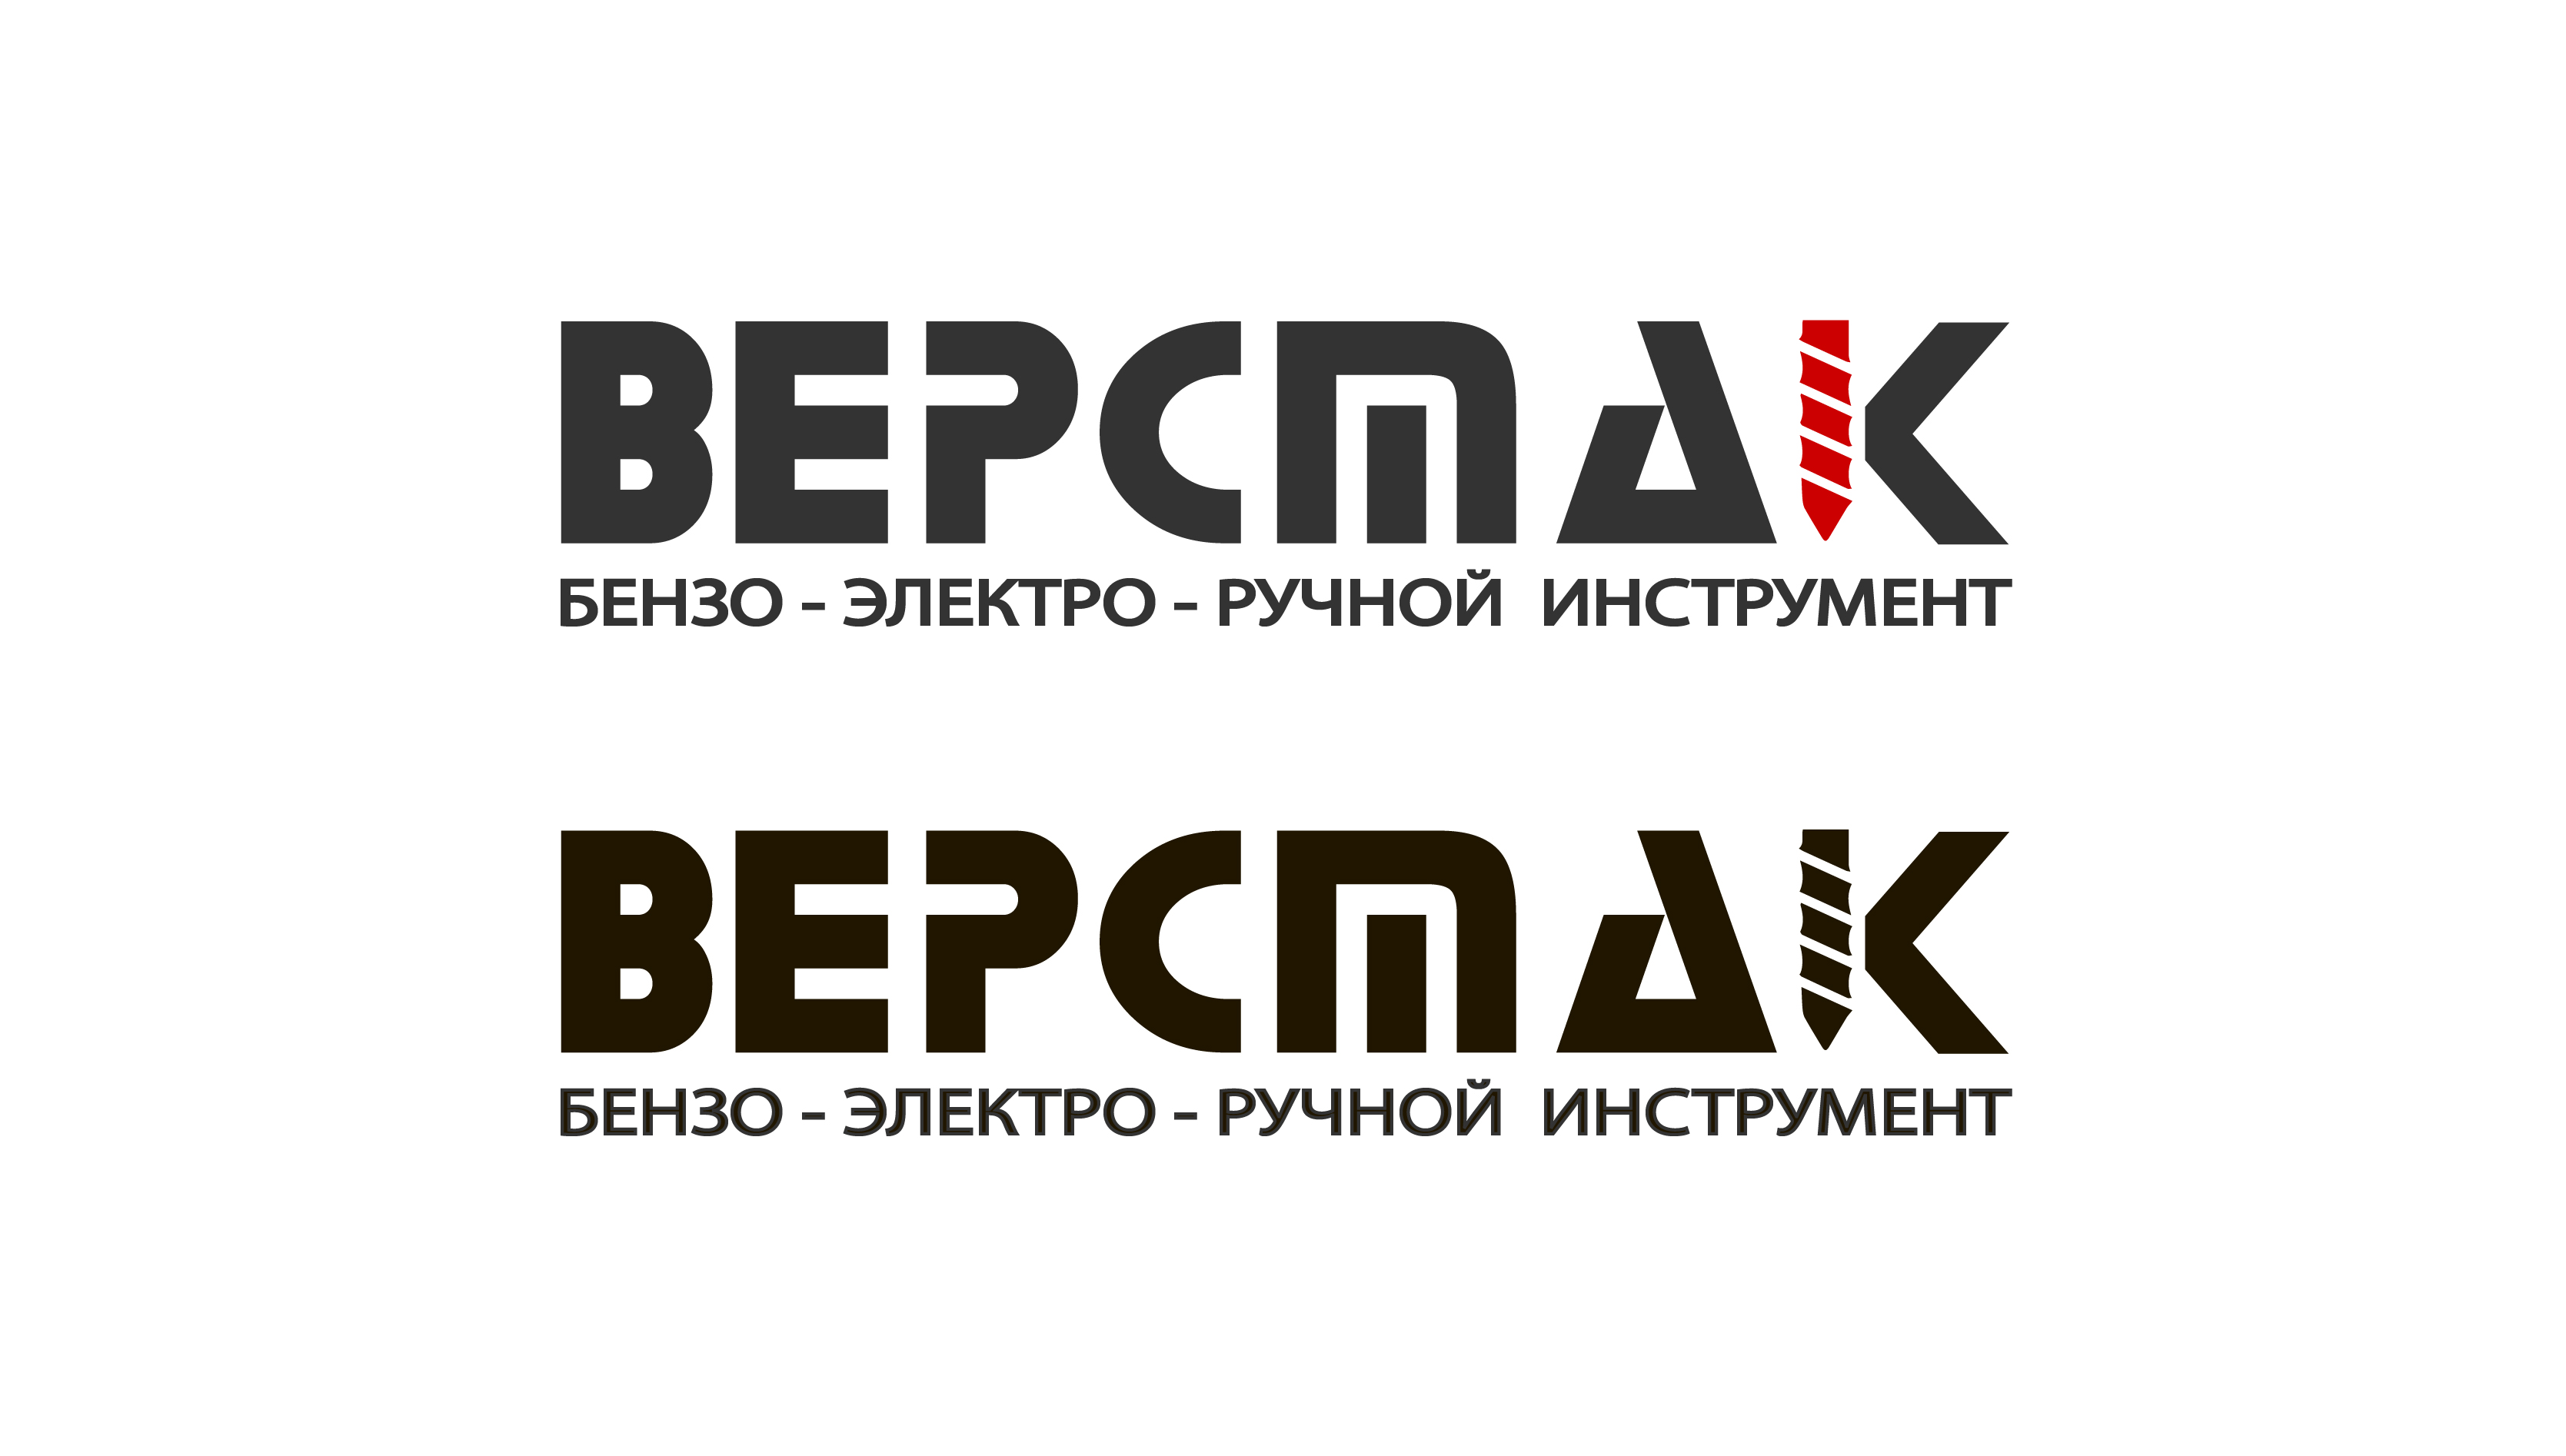 Логотип магазина бензо, электро, ручного инструмента фото f_2195a0f43bf8ad06.jpg